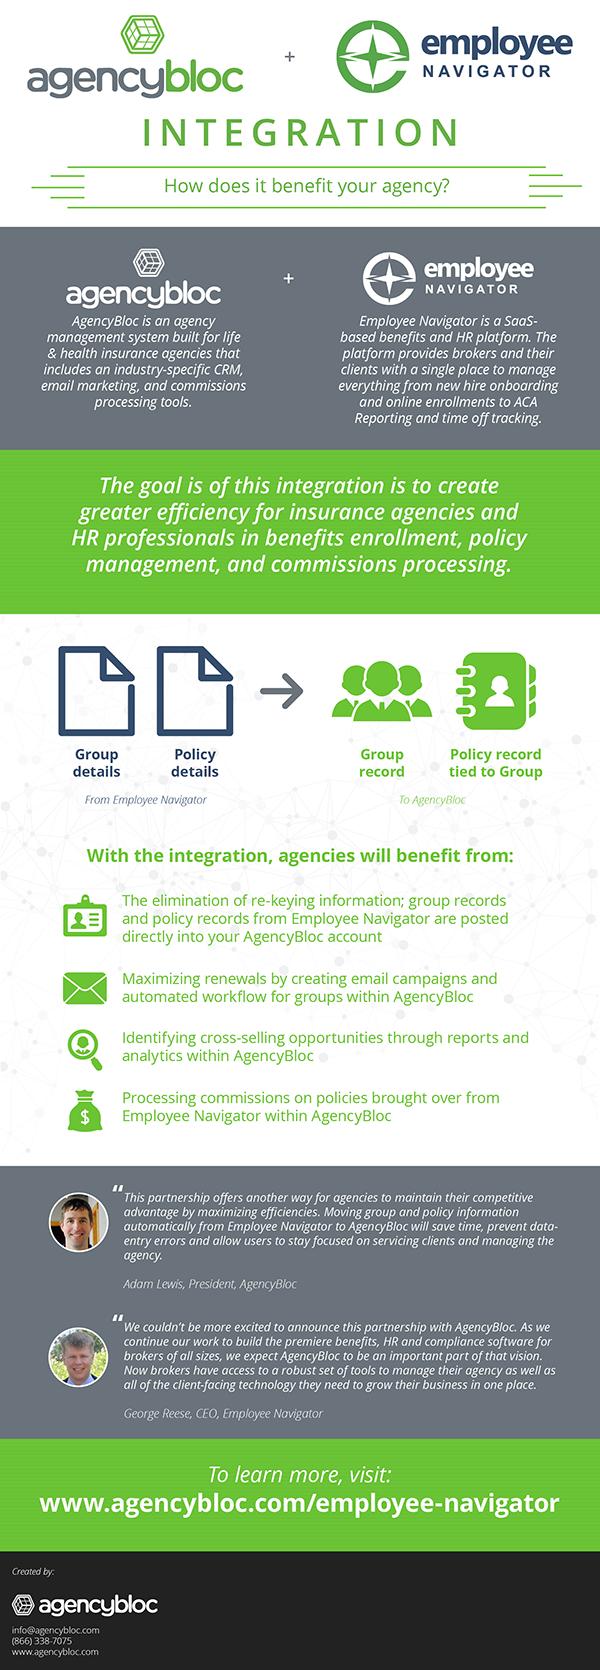 AgencyBloc Employee Navigator integration